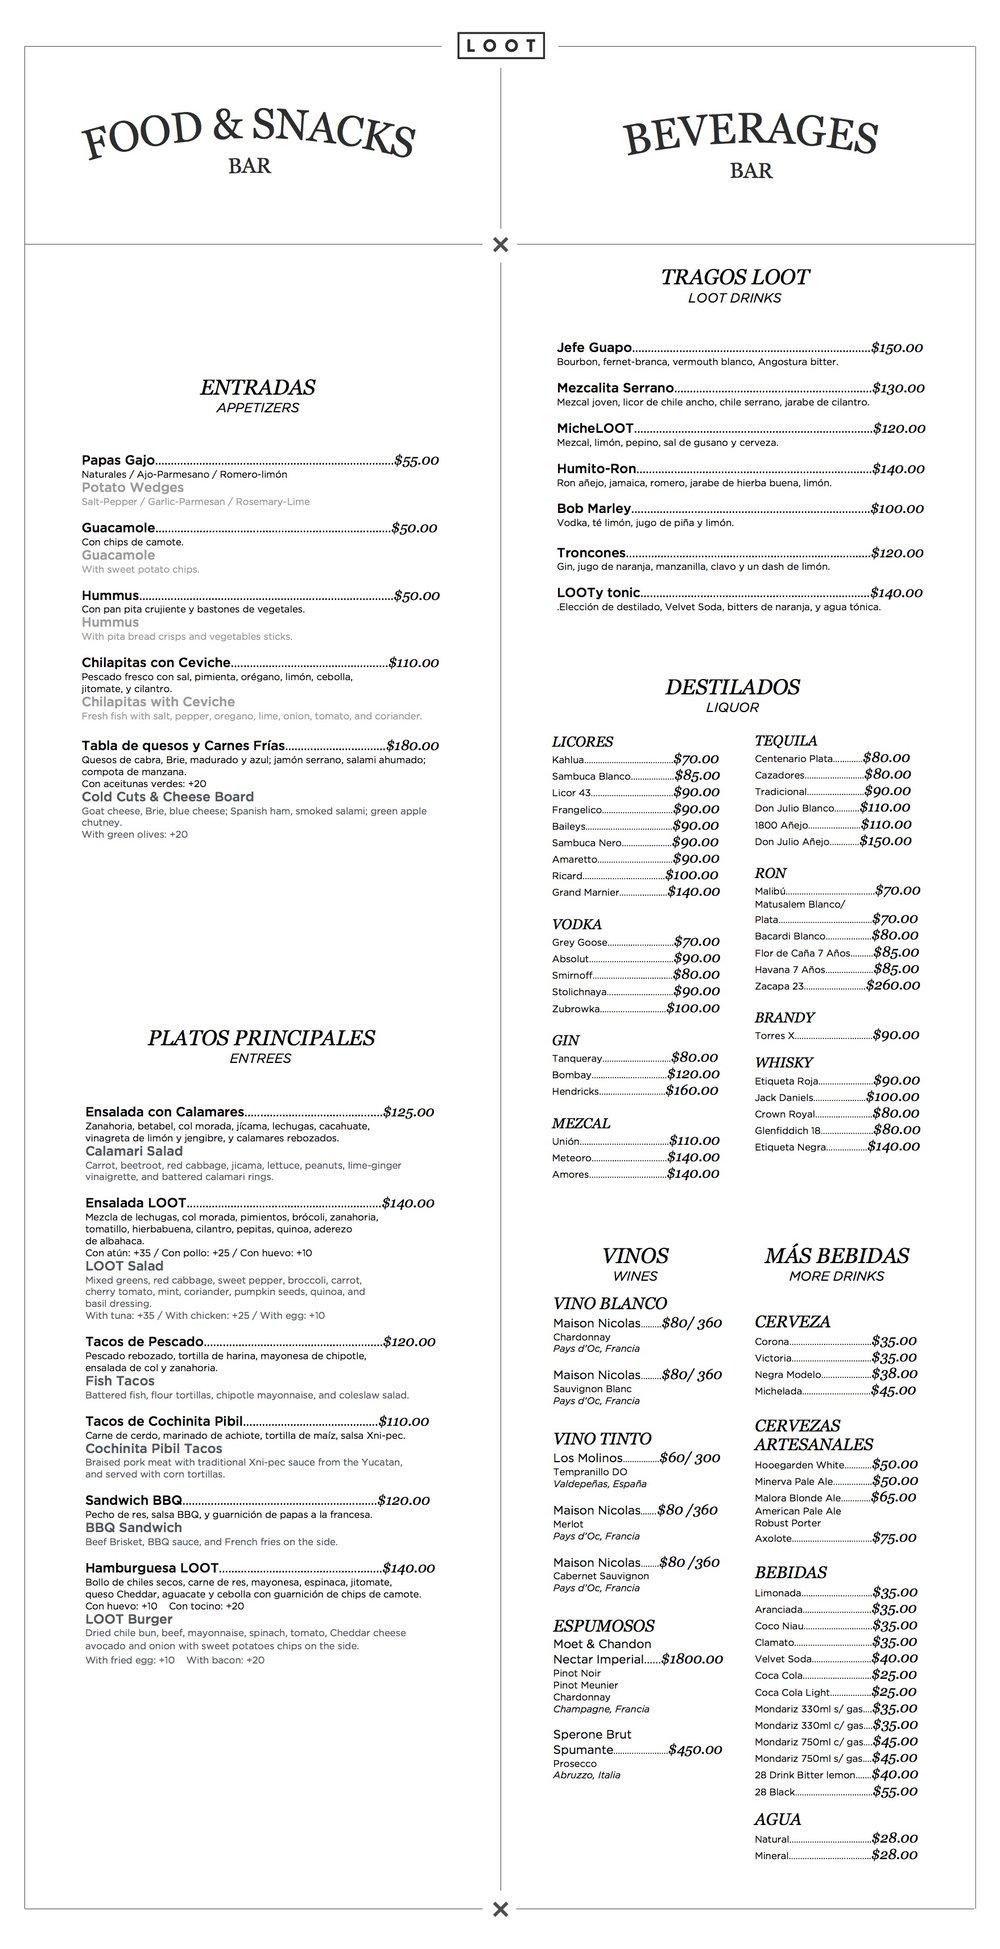 loot-bar-food-drink-restaurant-menu